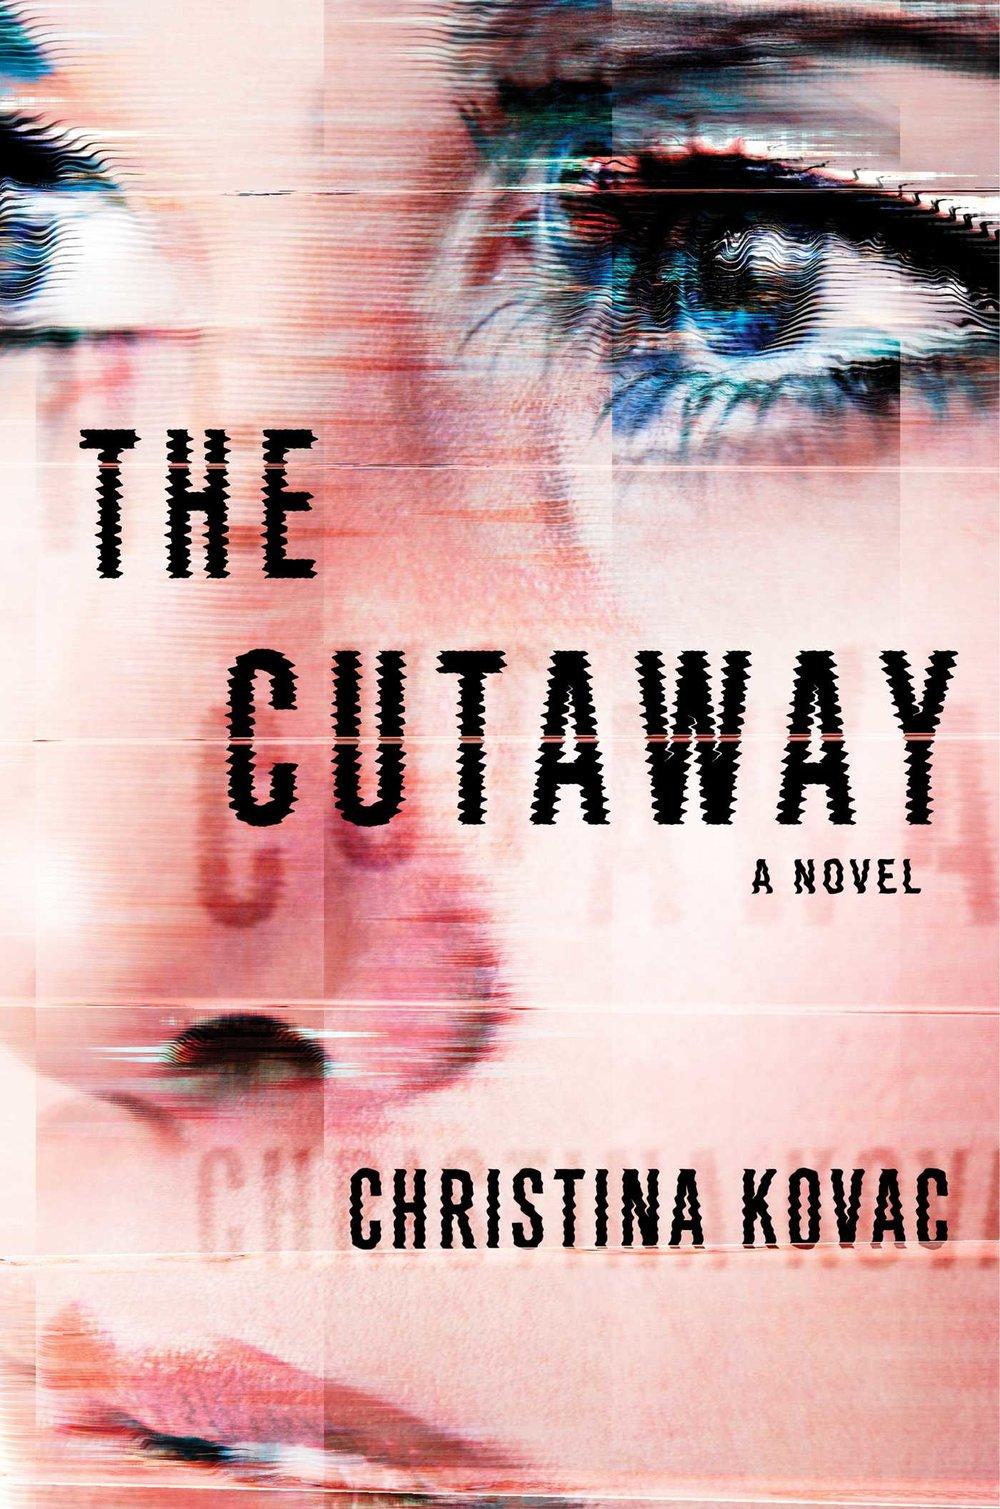 Buy Christina Kovac's novel  The Cutaway